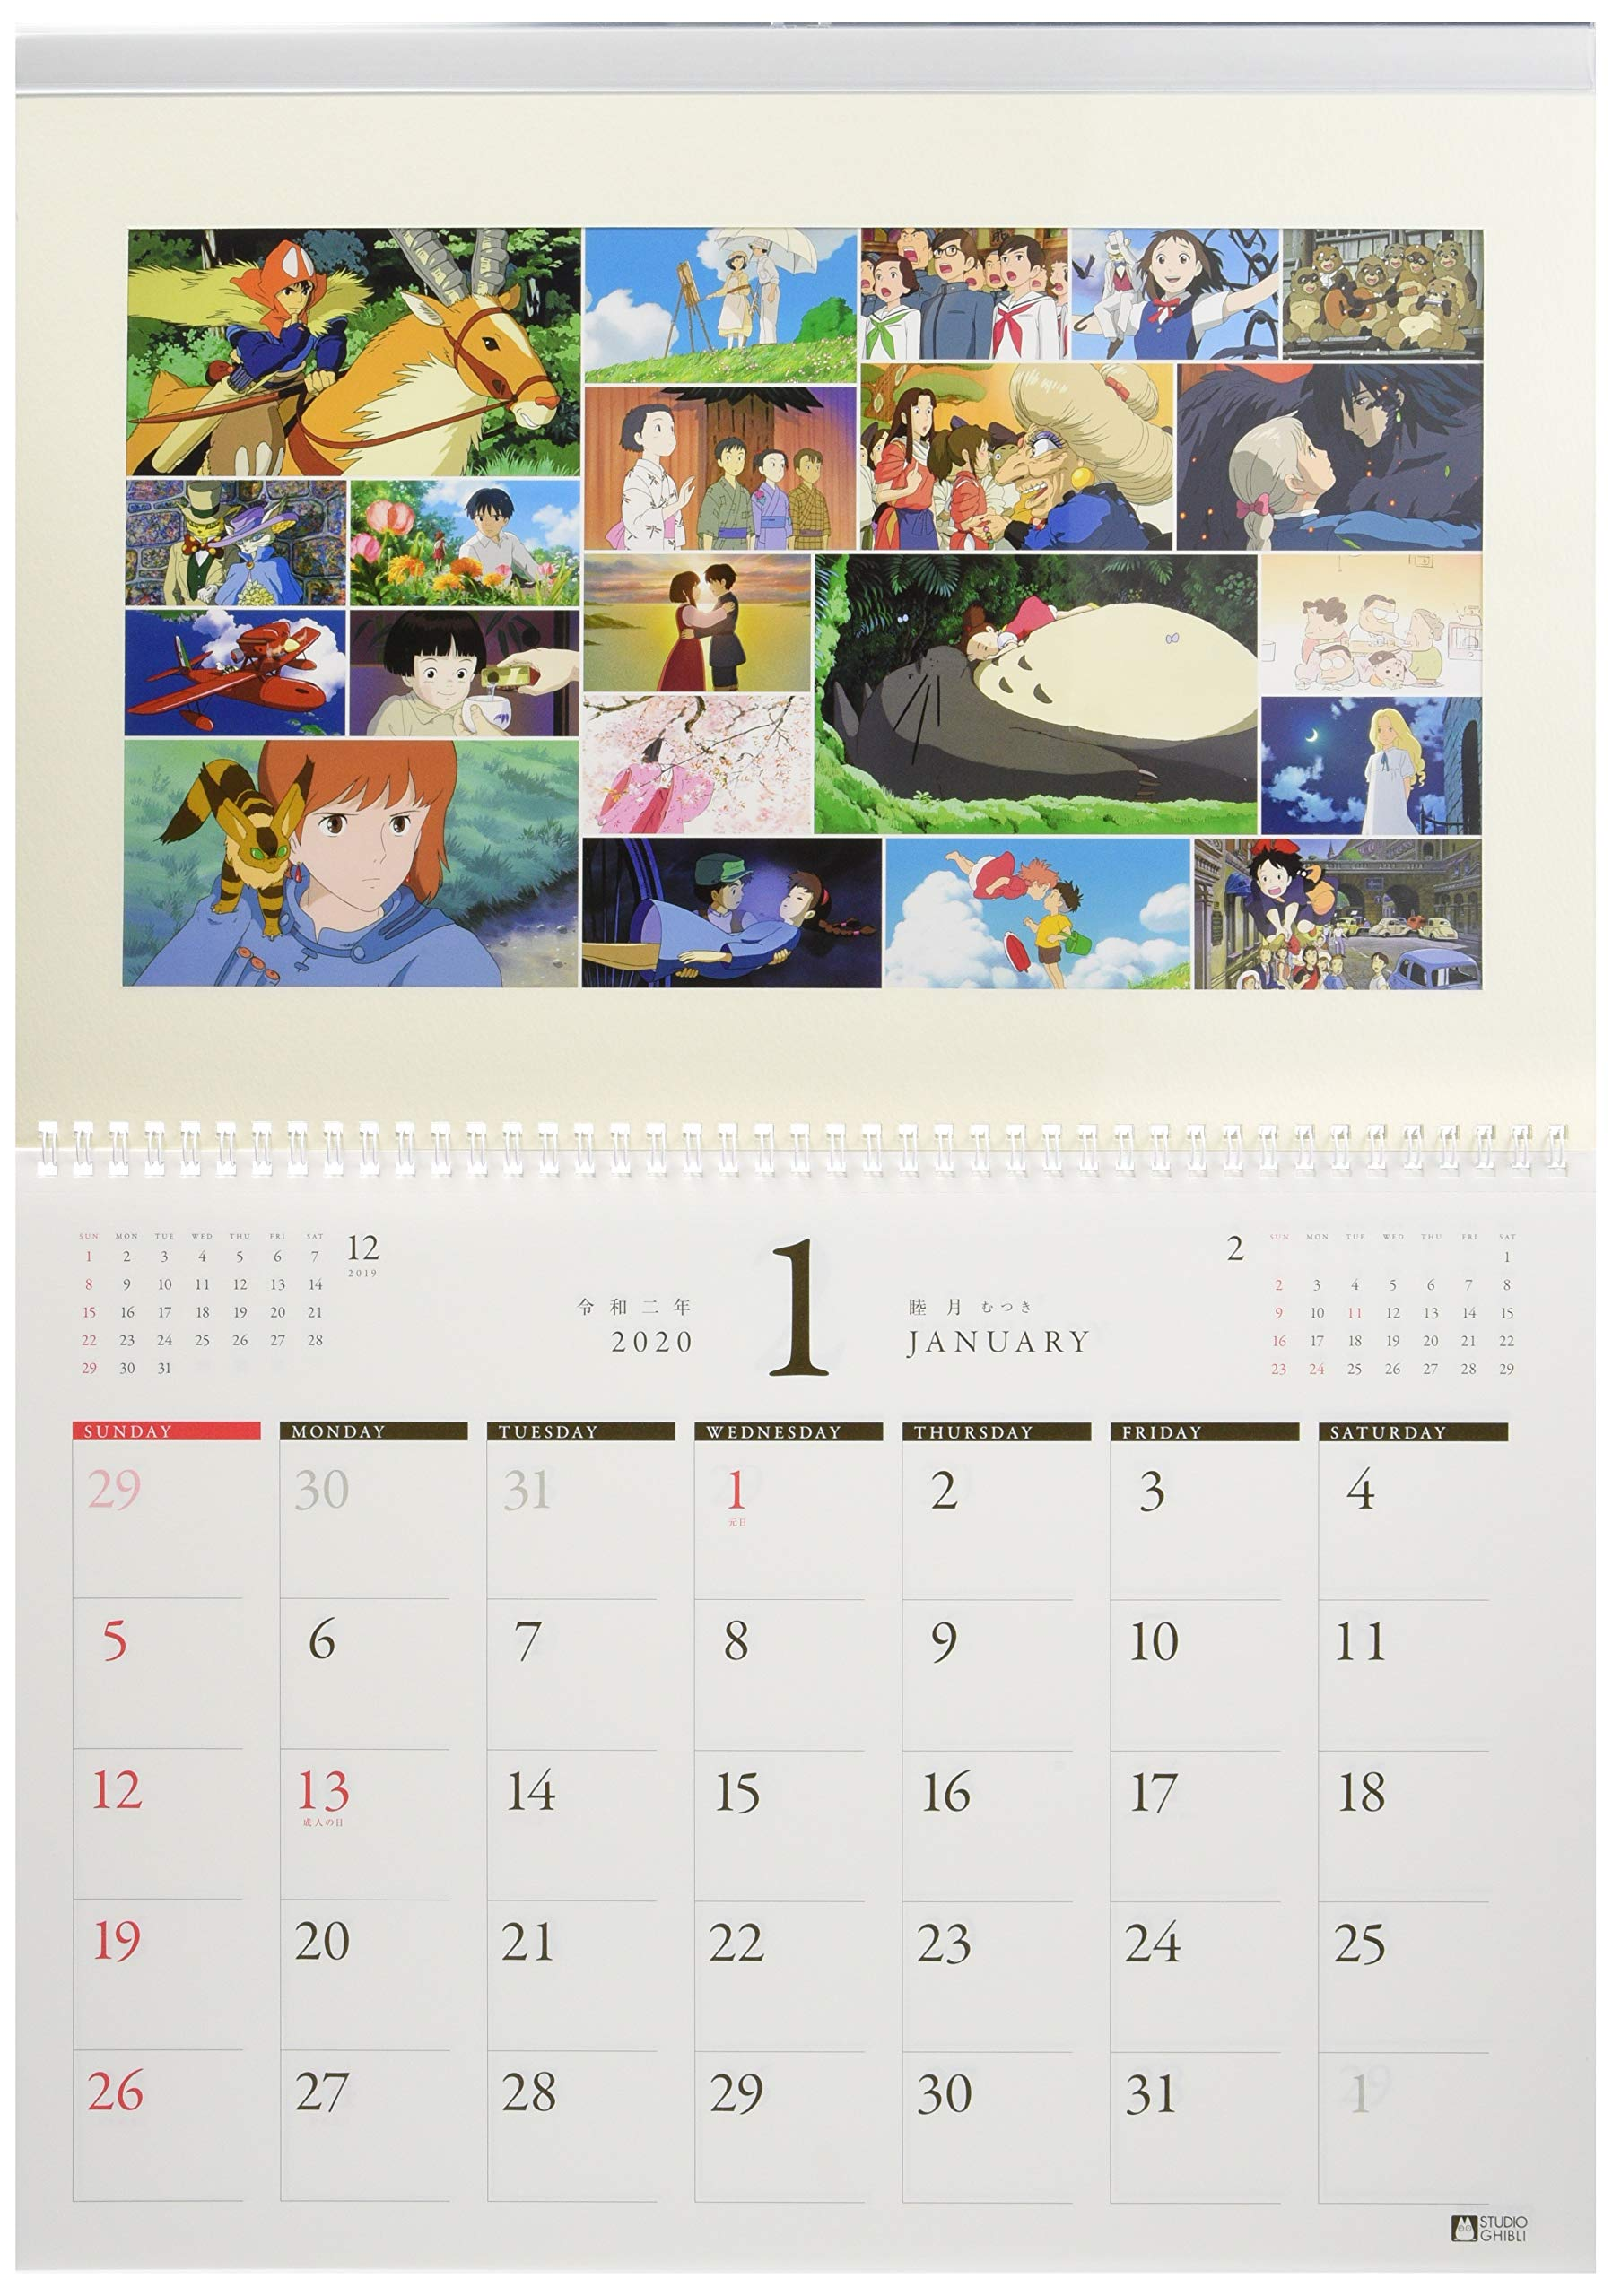 Ensky 2020 Studio Ghibli Art Frame Wall Calendar CL 2 Anime